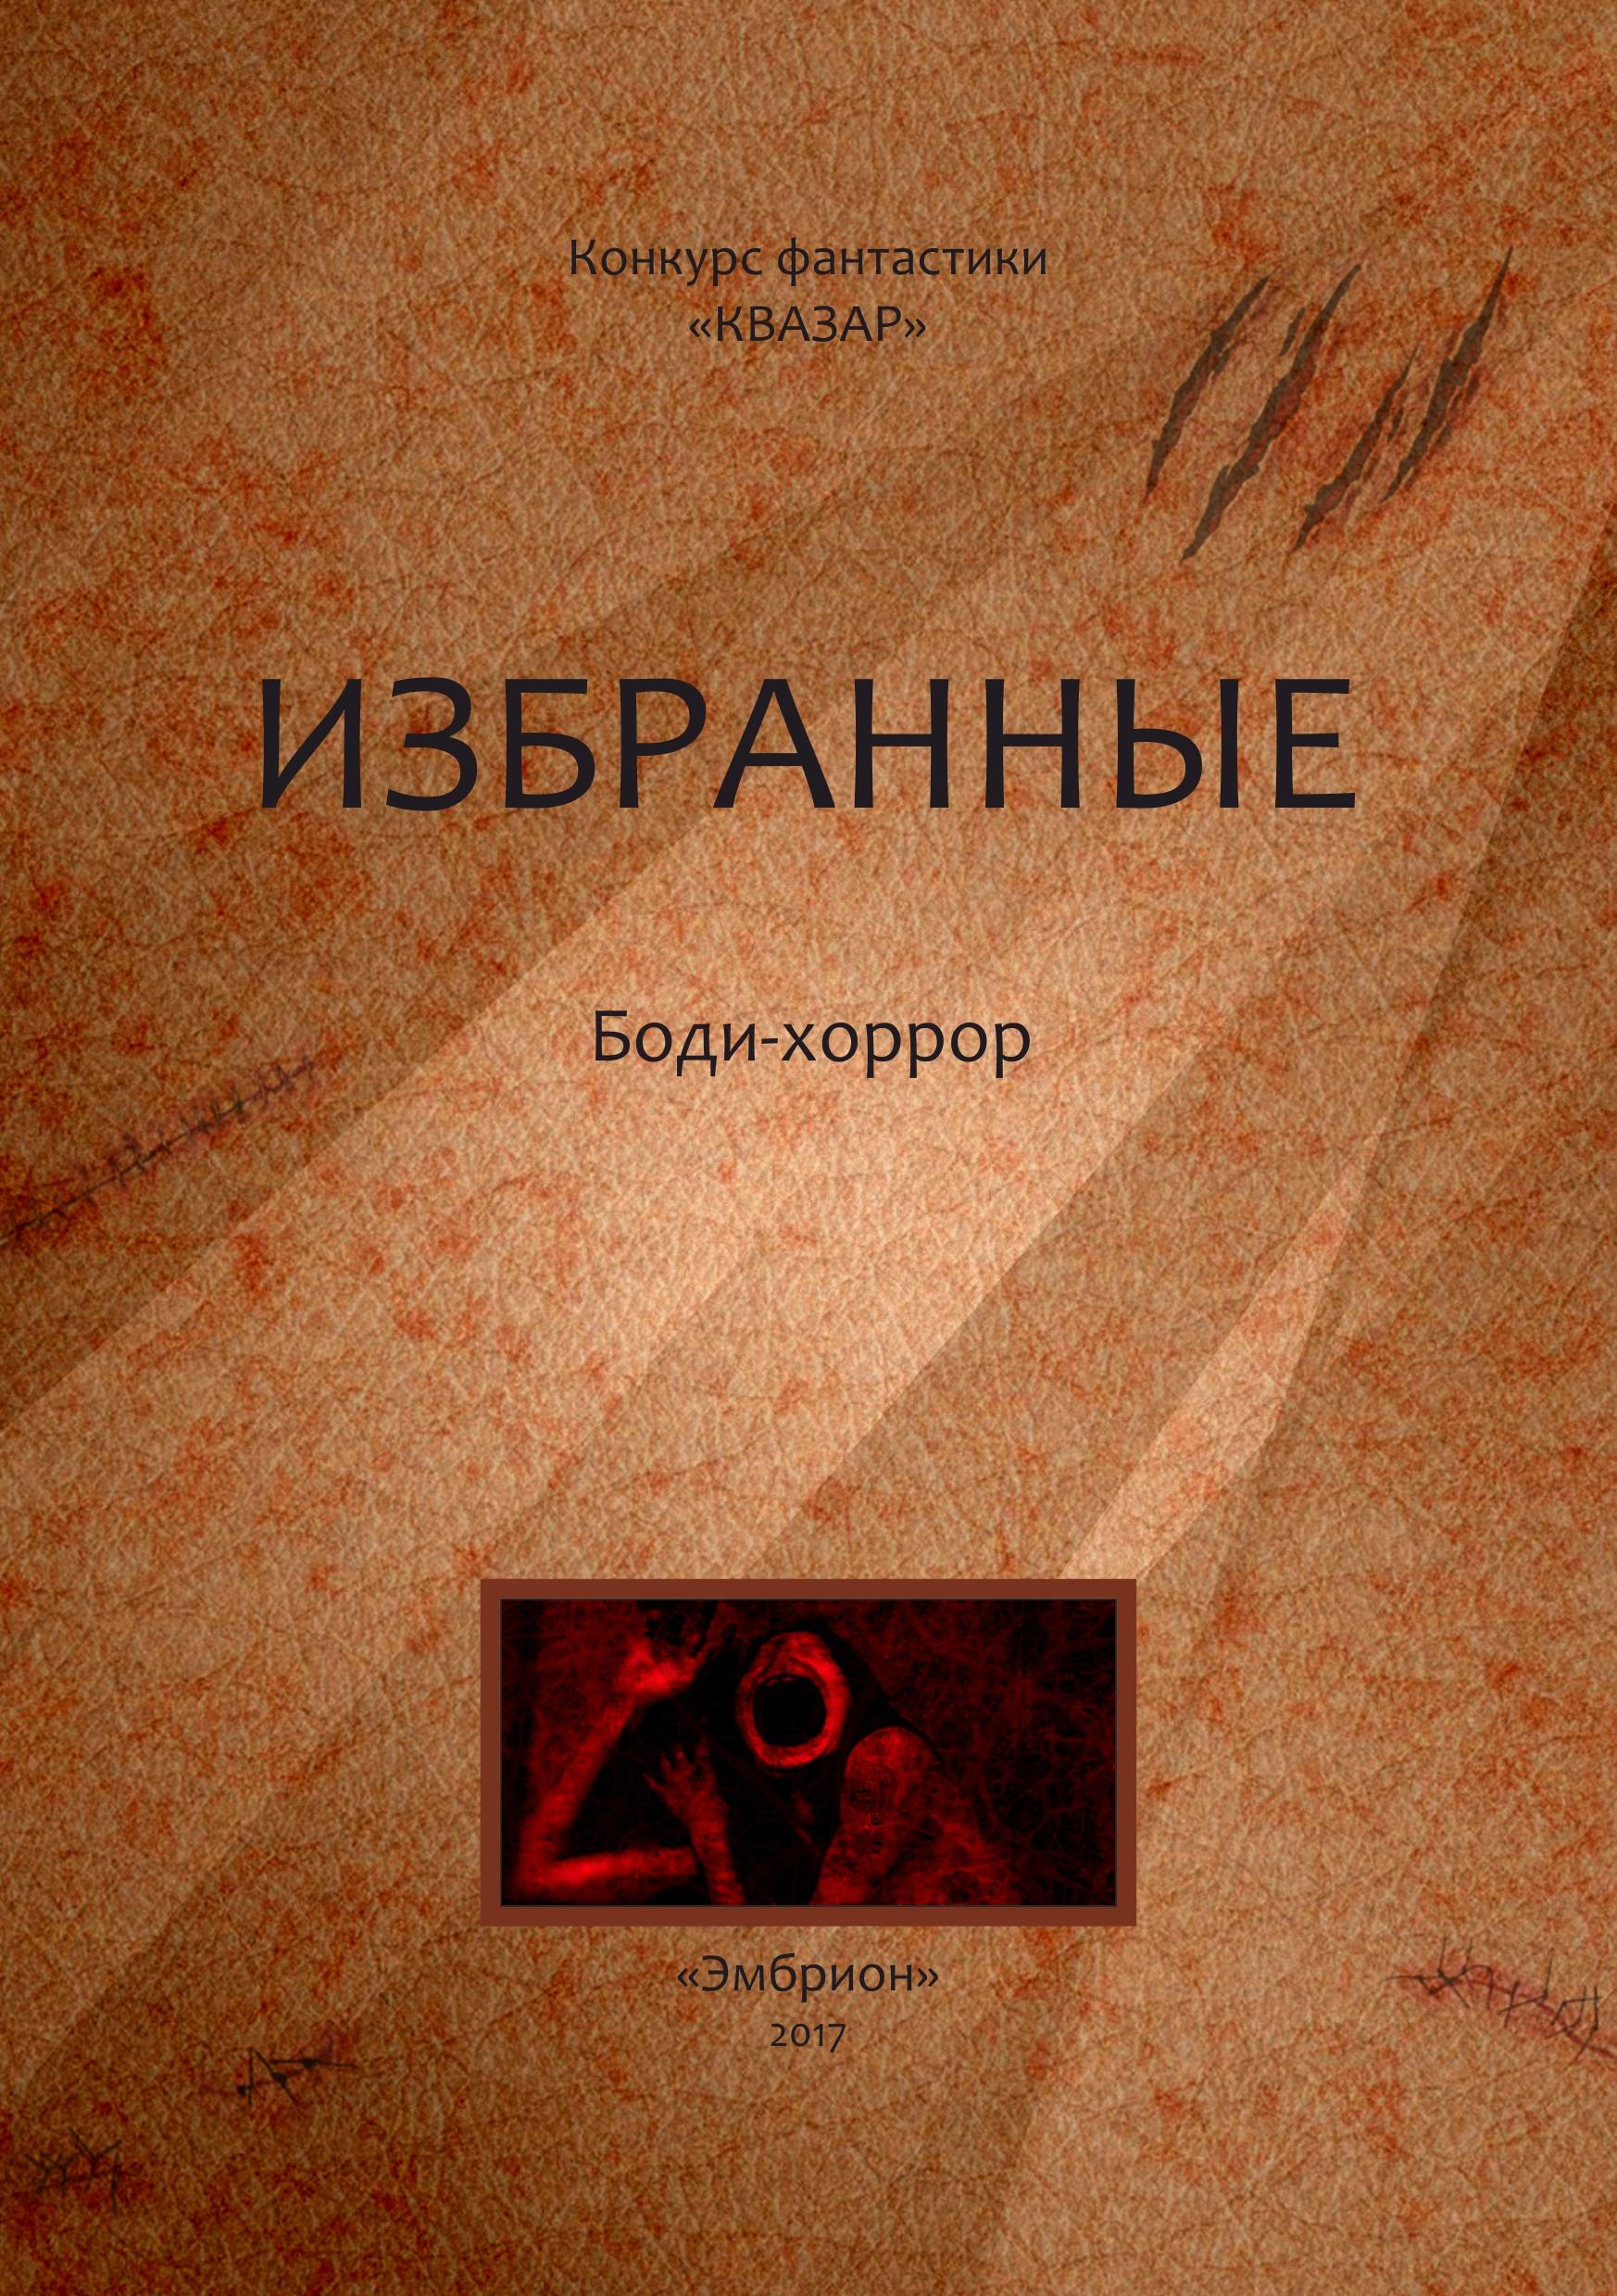 обложка_v2-2